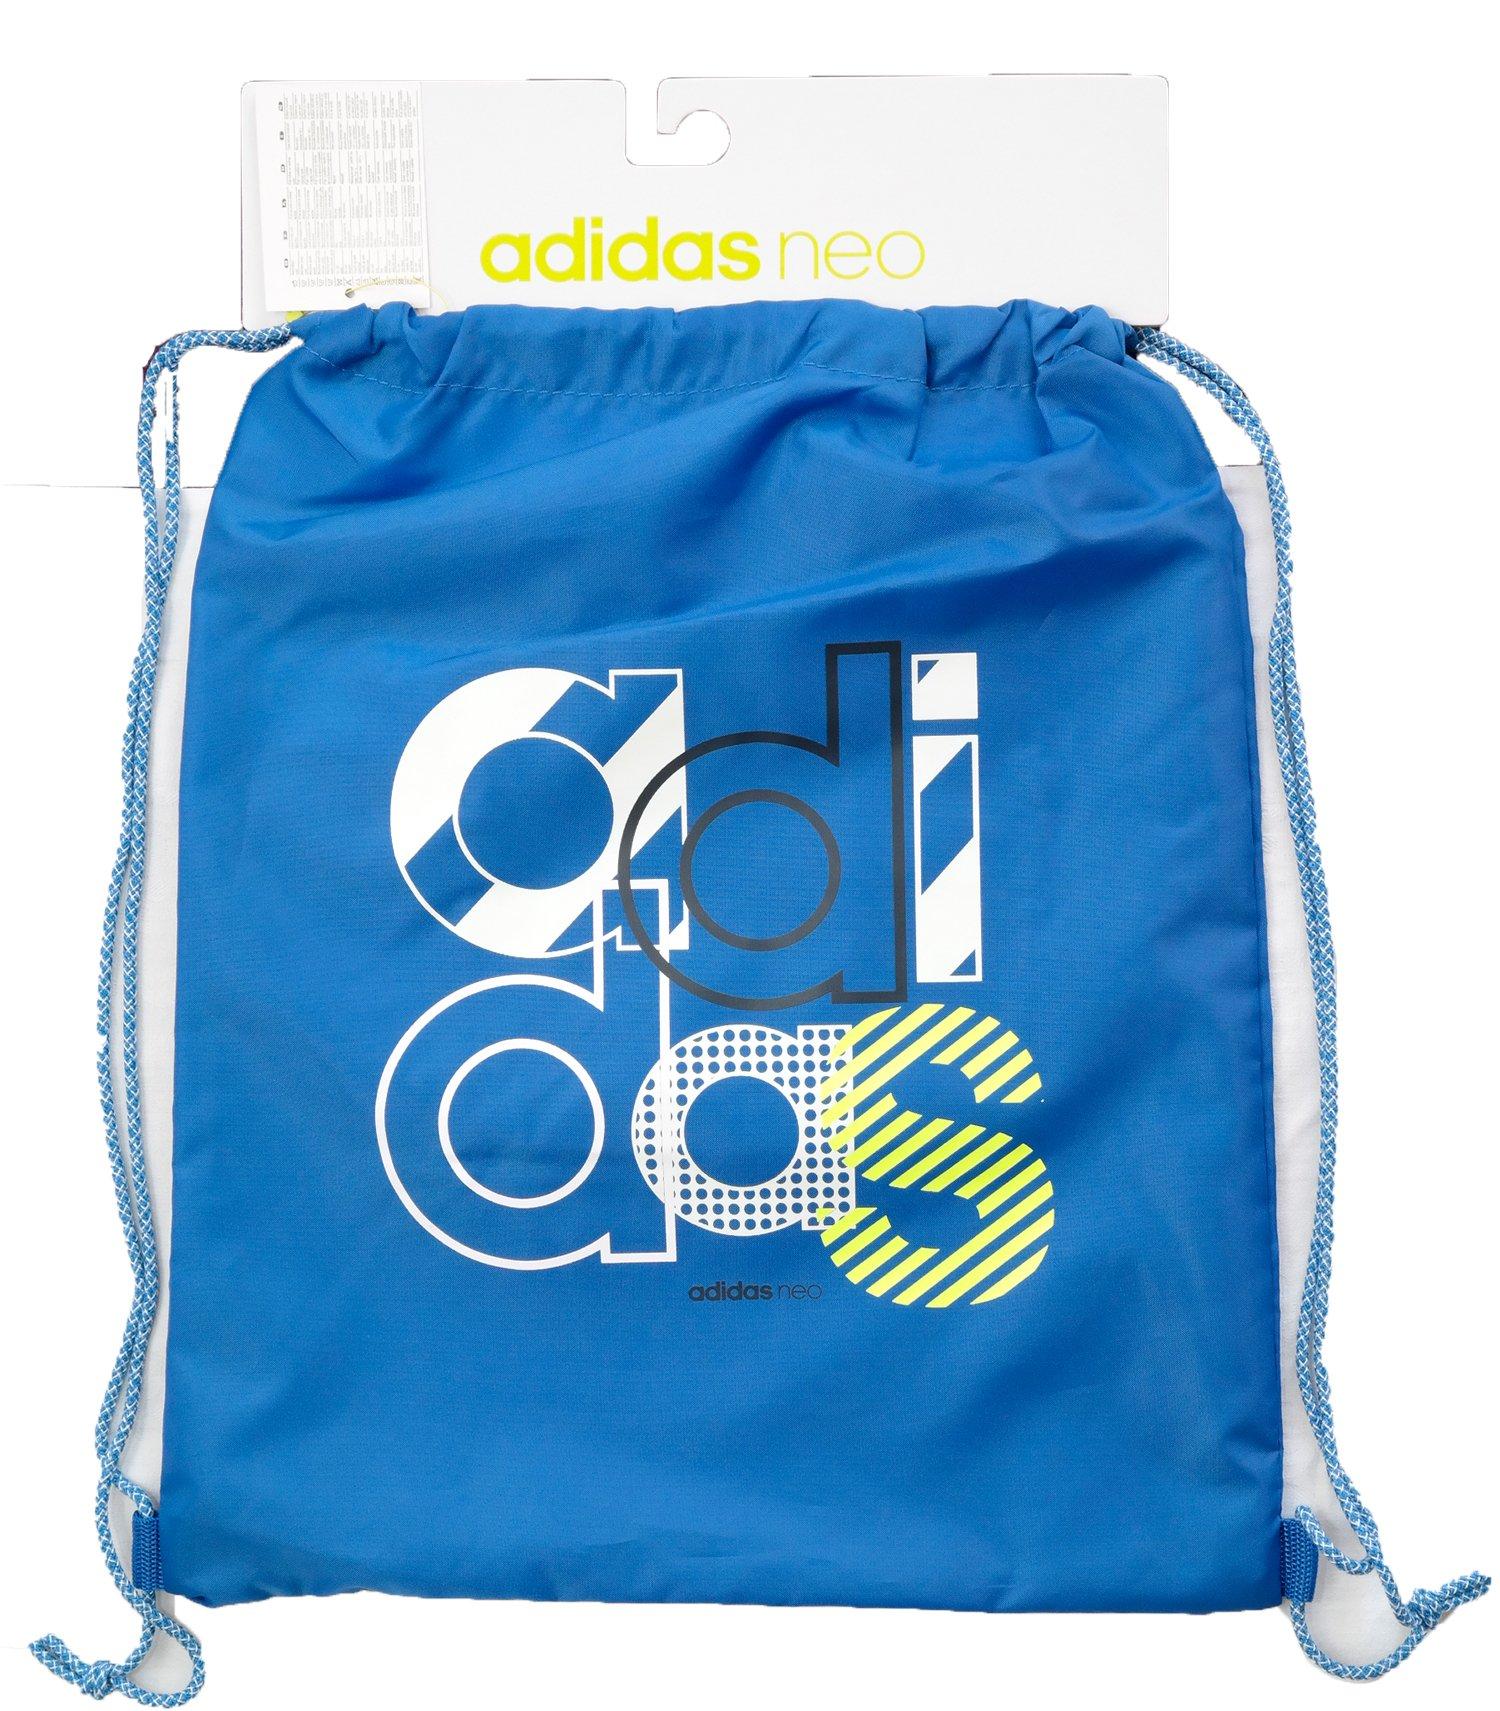 dd87ea80caf25 ADIDAS NEO torba worek plecak na buty akcesoria na Bazarek.pl